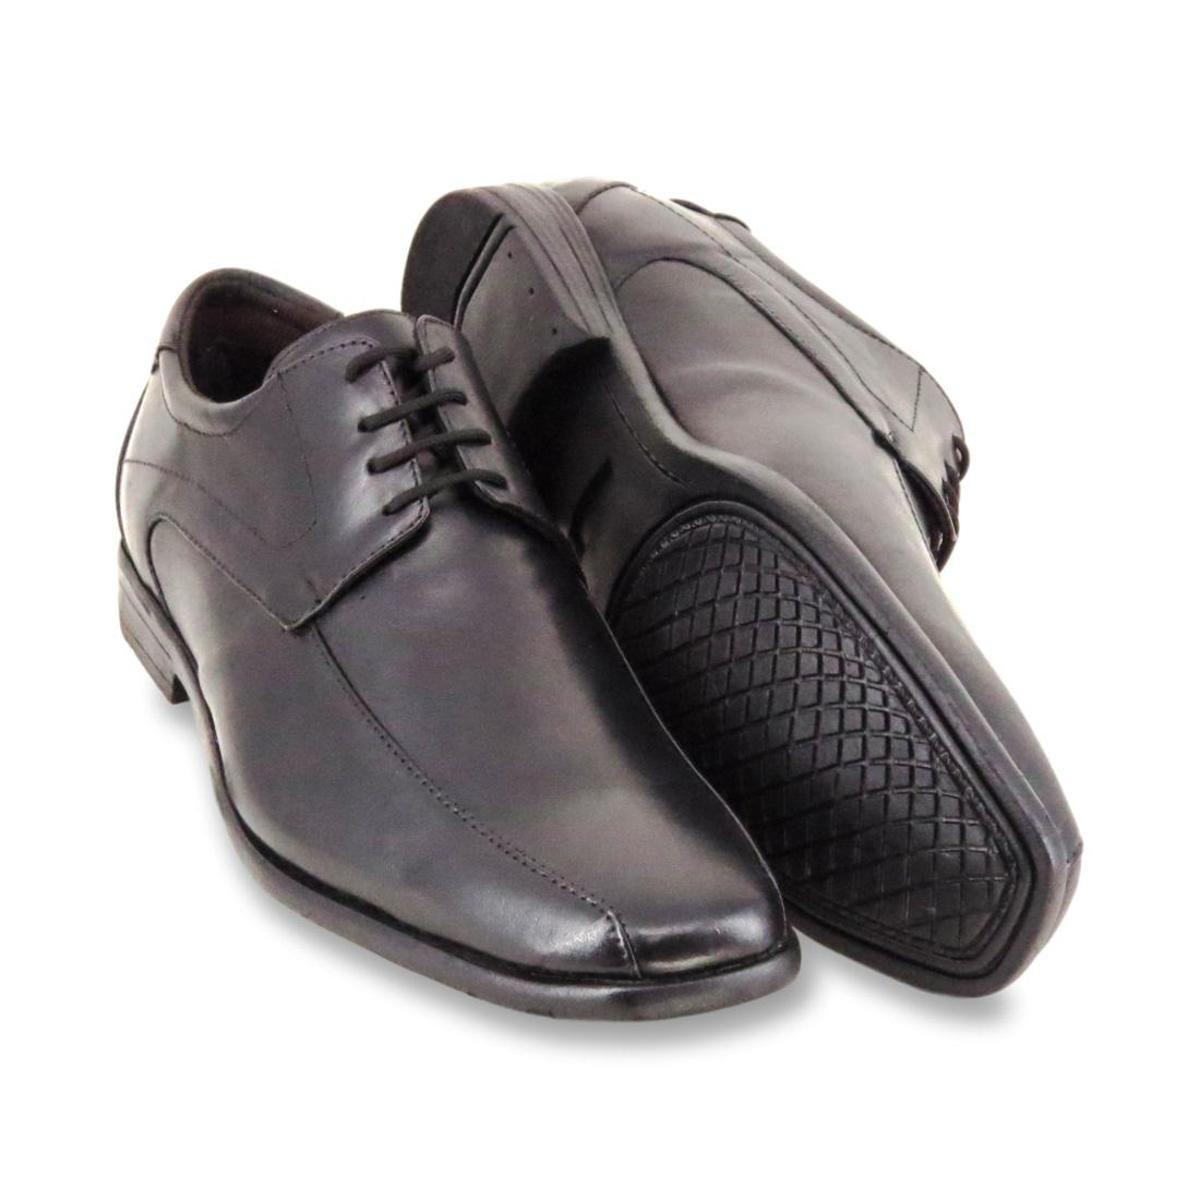 Sapato Enviamix Couro Cinto Masculino Sapato Social Carteira Social Carteira Preto Enviamix Kit Kit Cinto Couro Masculino qCCTwY